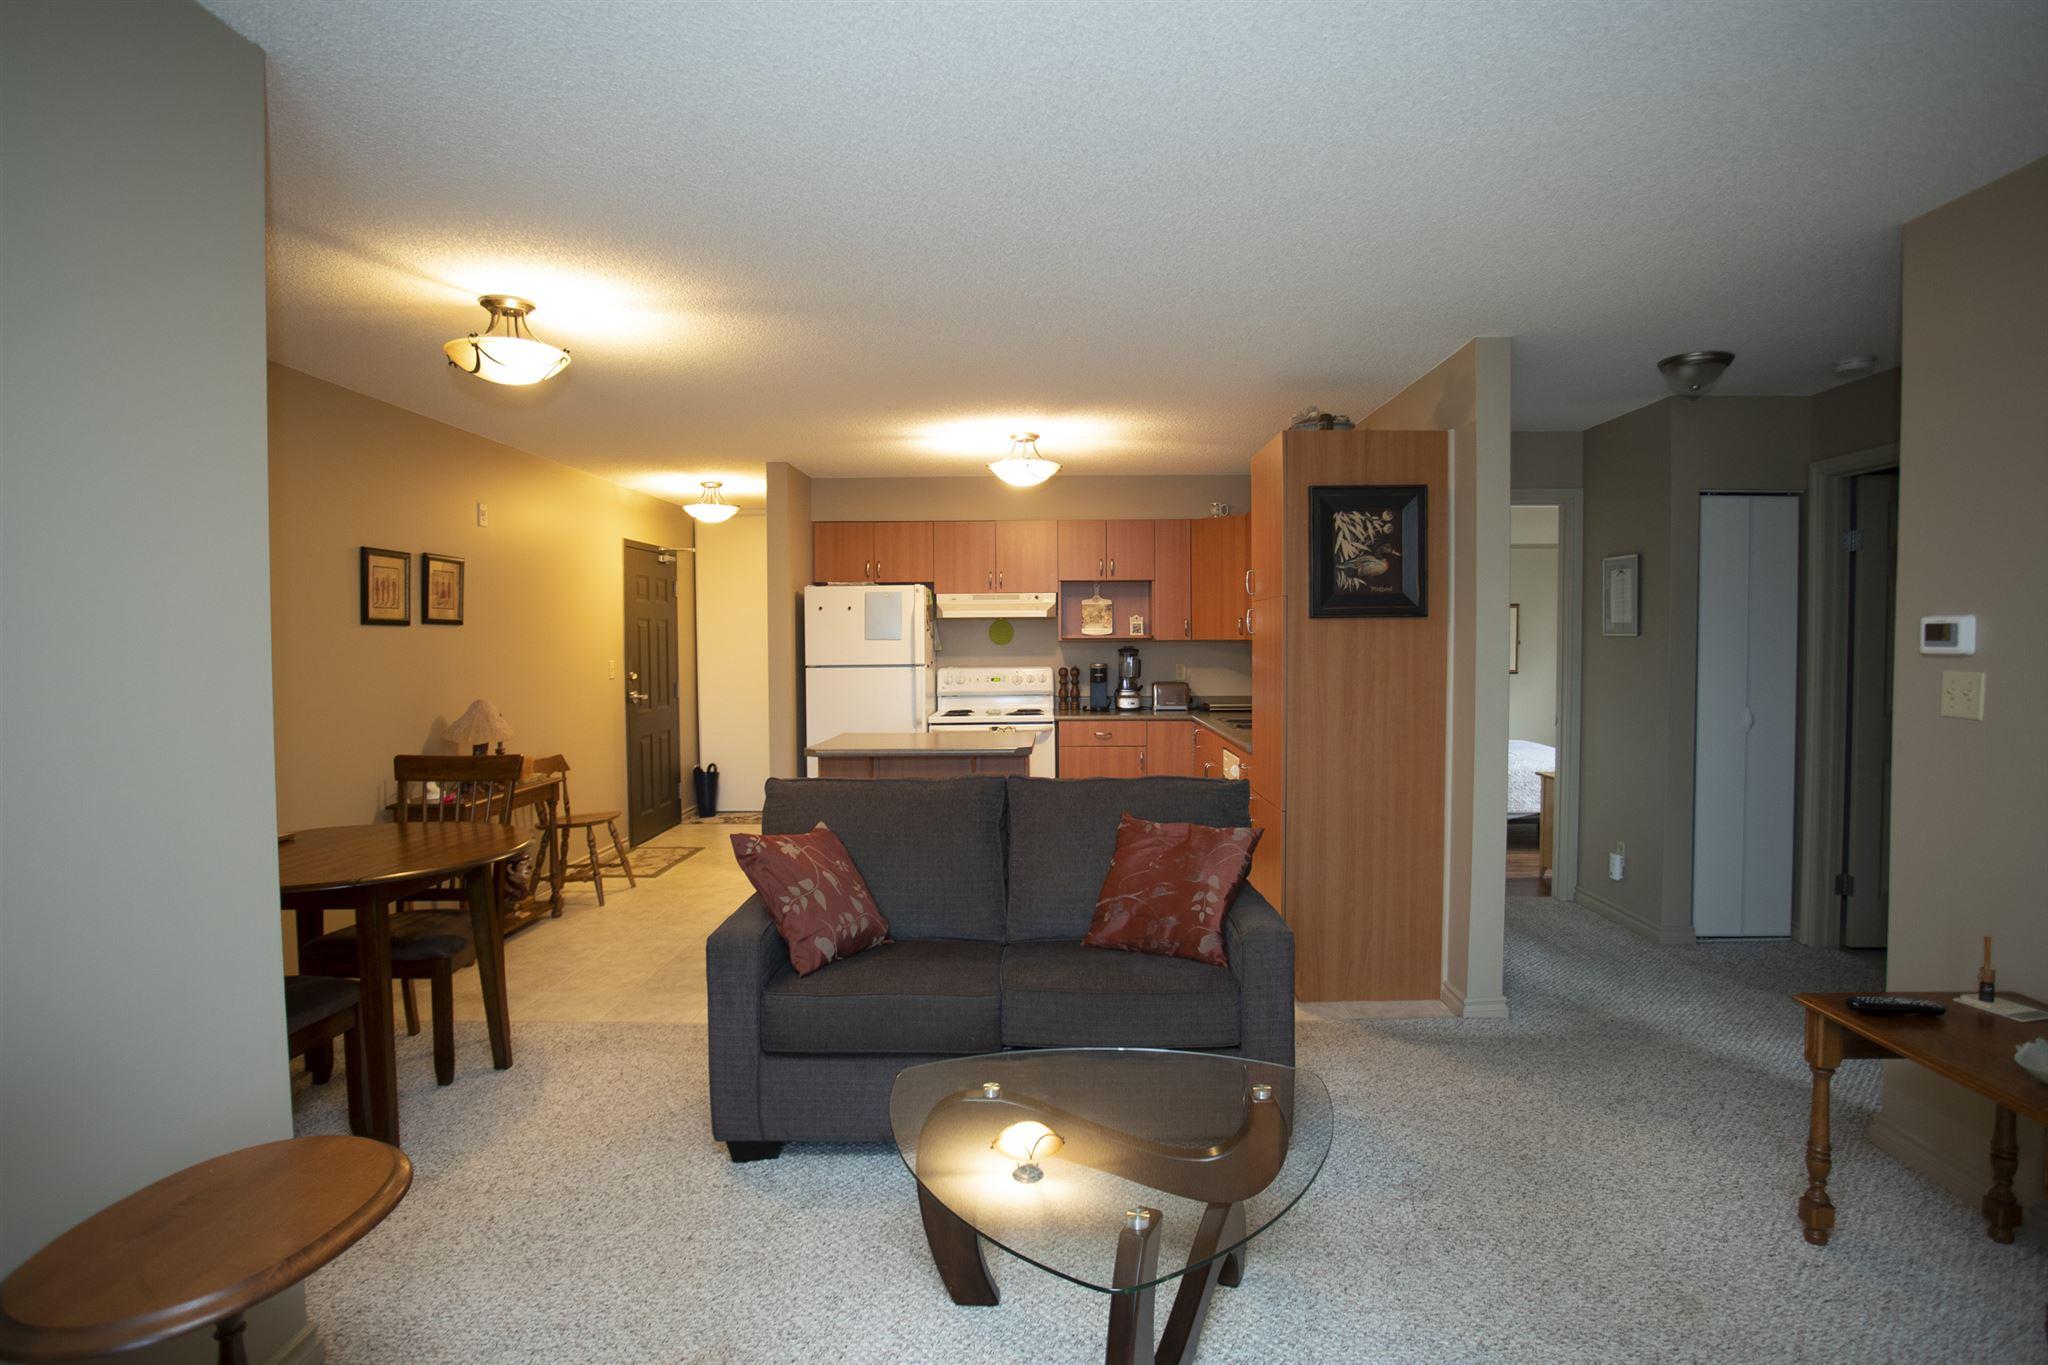 303 2813 Arthur Street E, Thunder Bay, Ontario (ID TB193503)